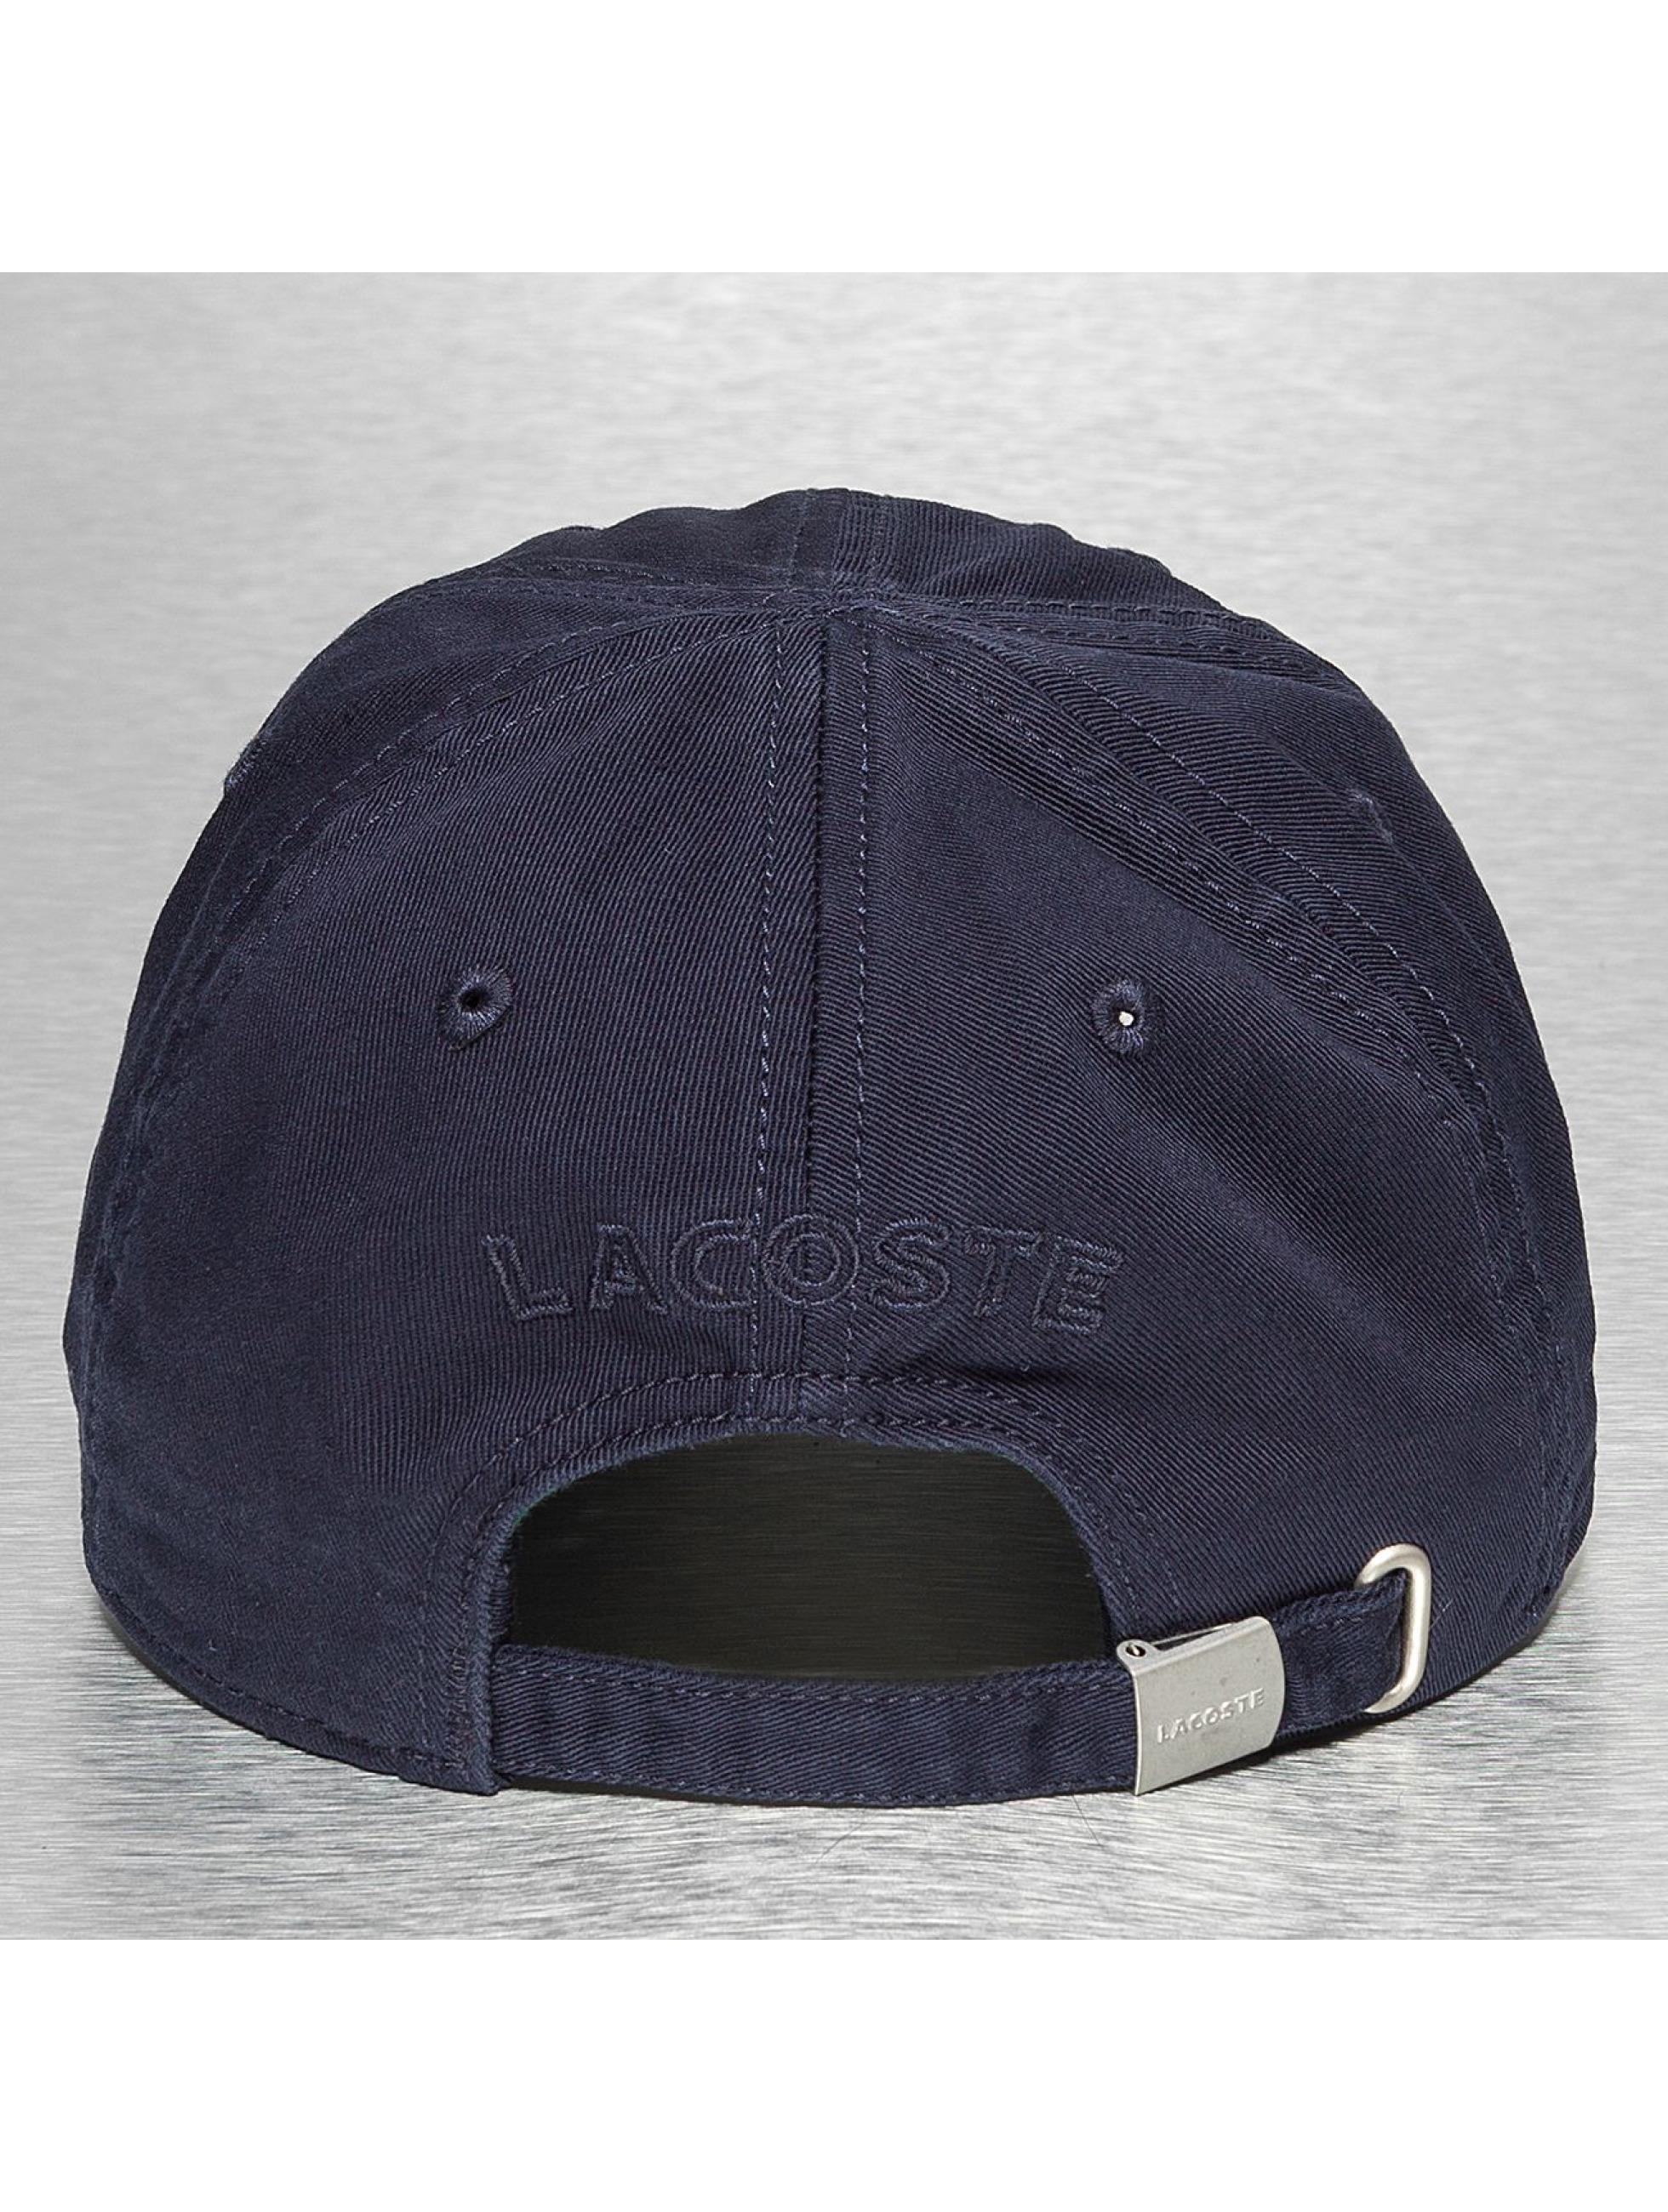 Lacoste Classic Snapback Cap Gabardine Croc Strapback Cap blau